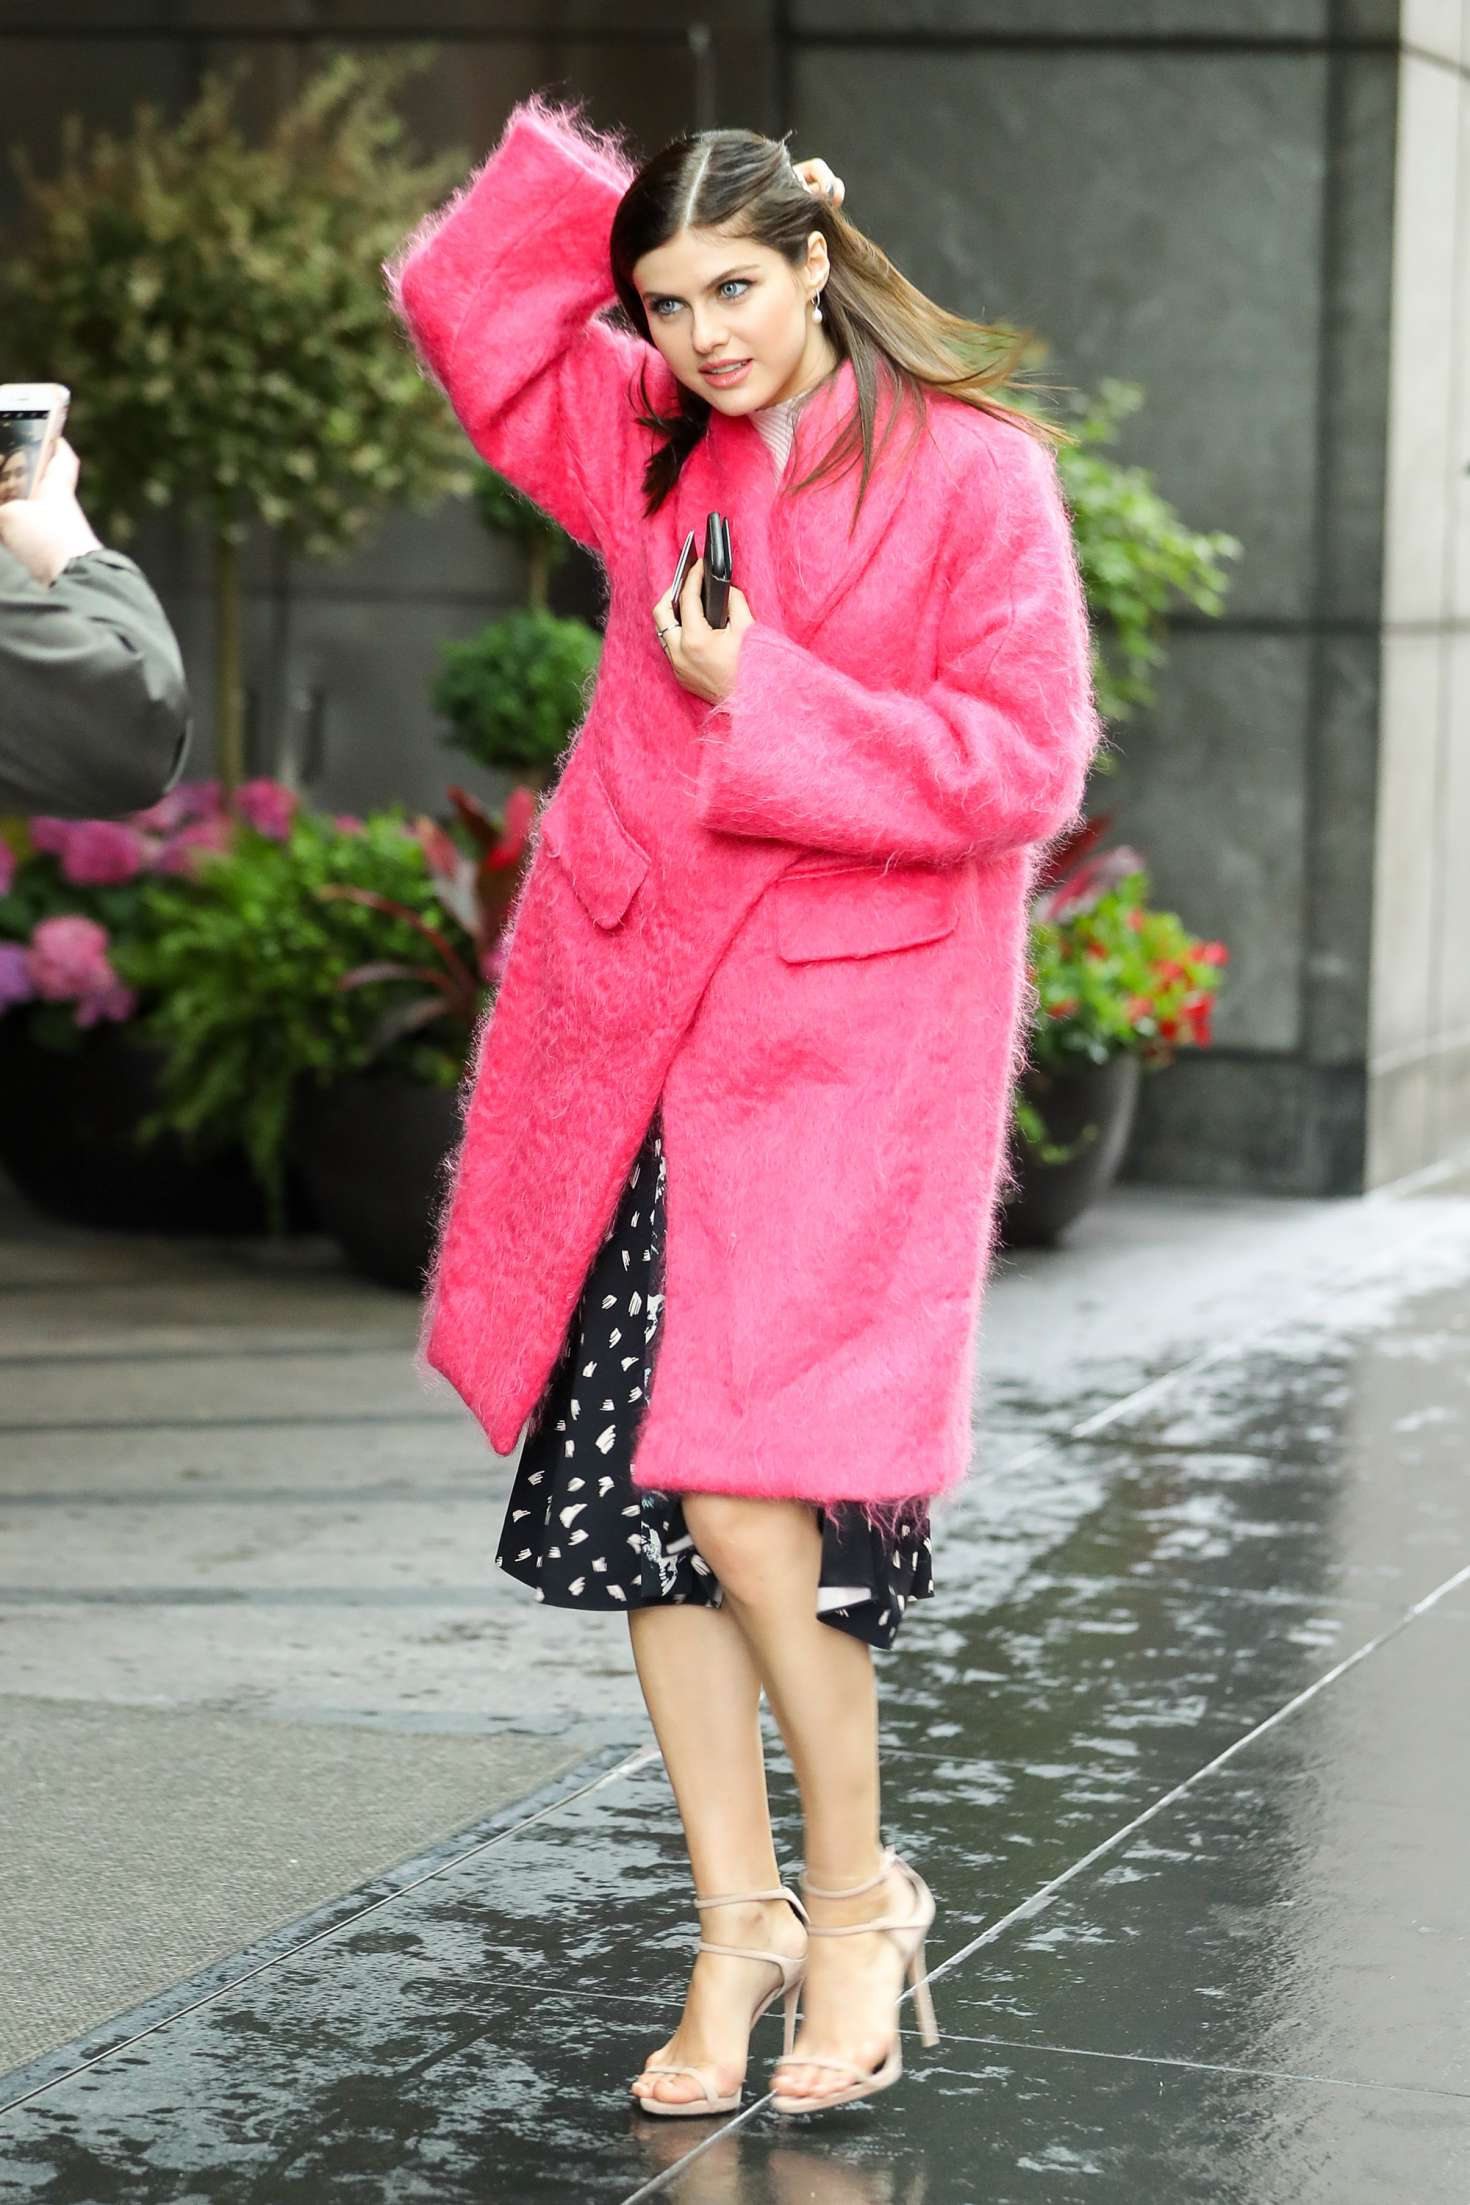 Alexandra Daddario In Pink Fur Coat Out In New York